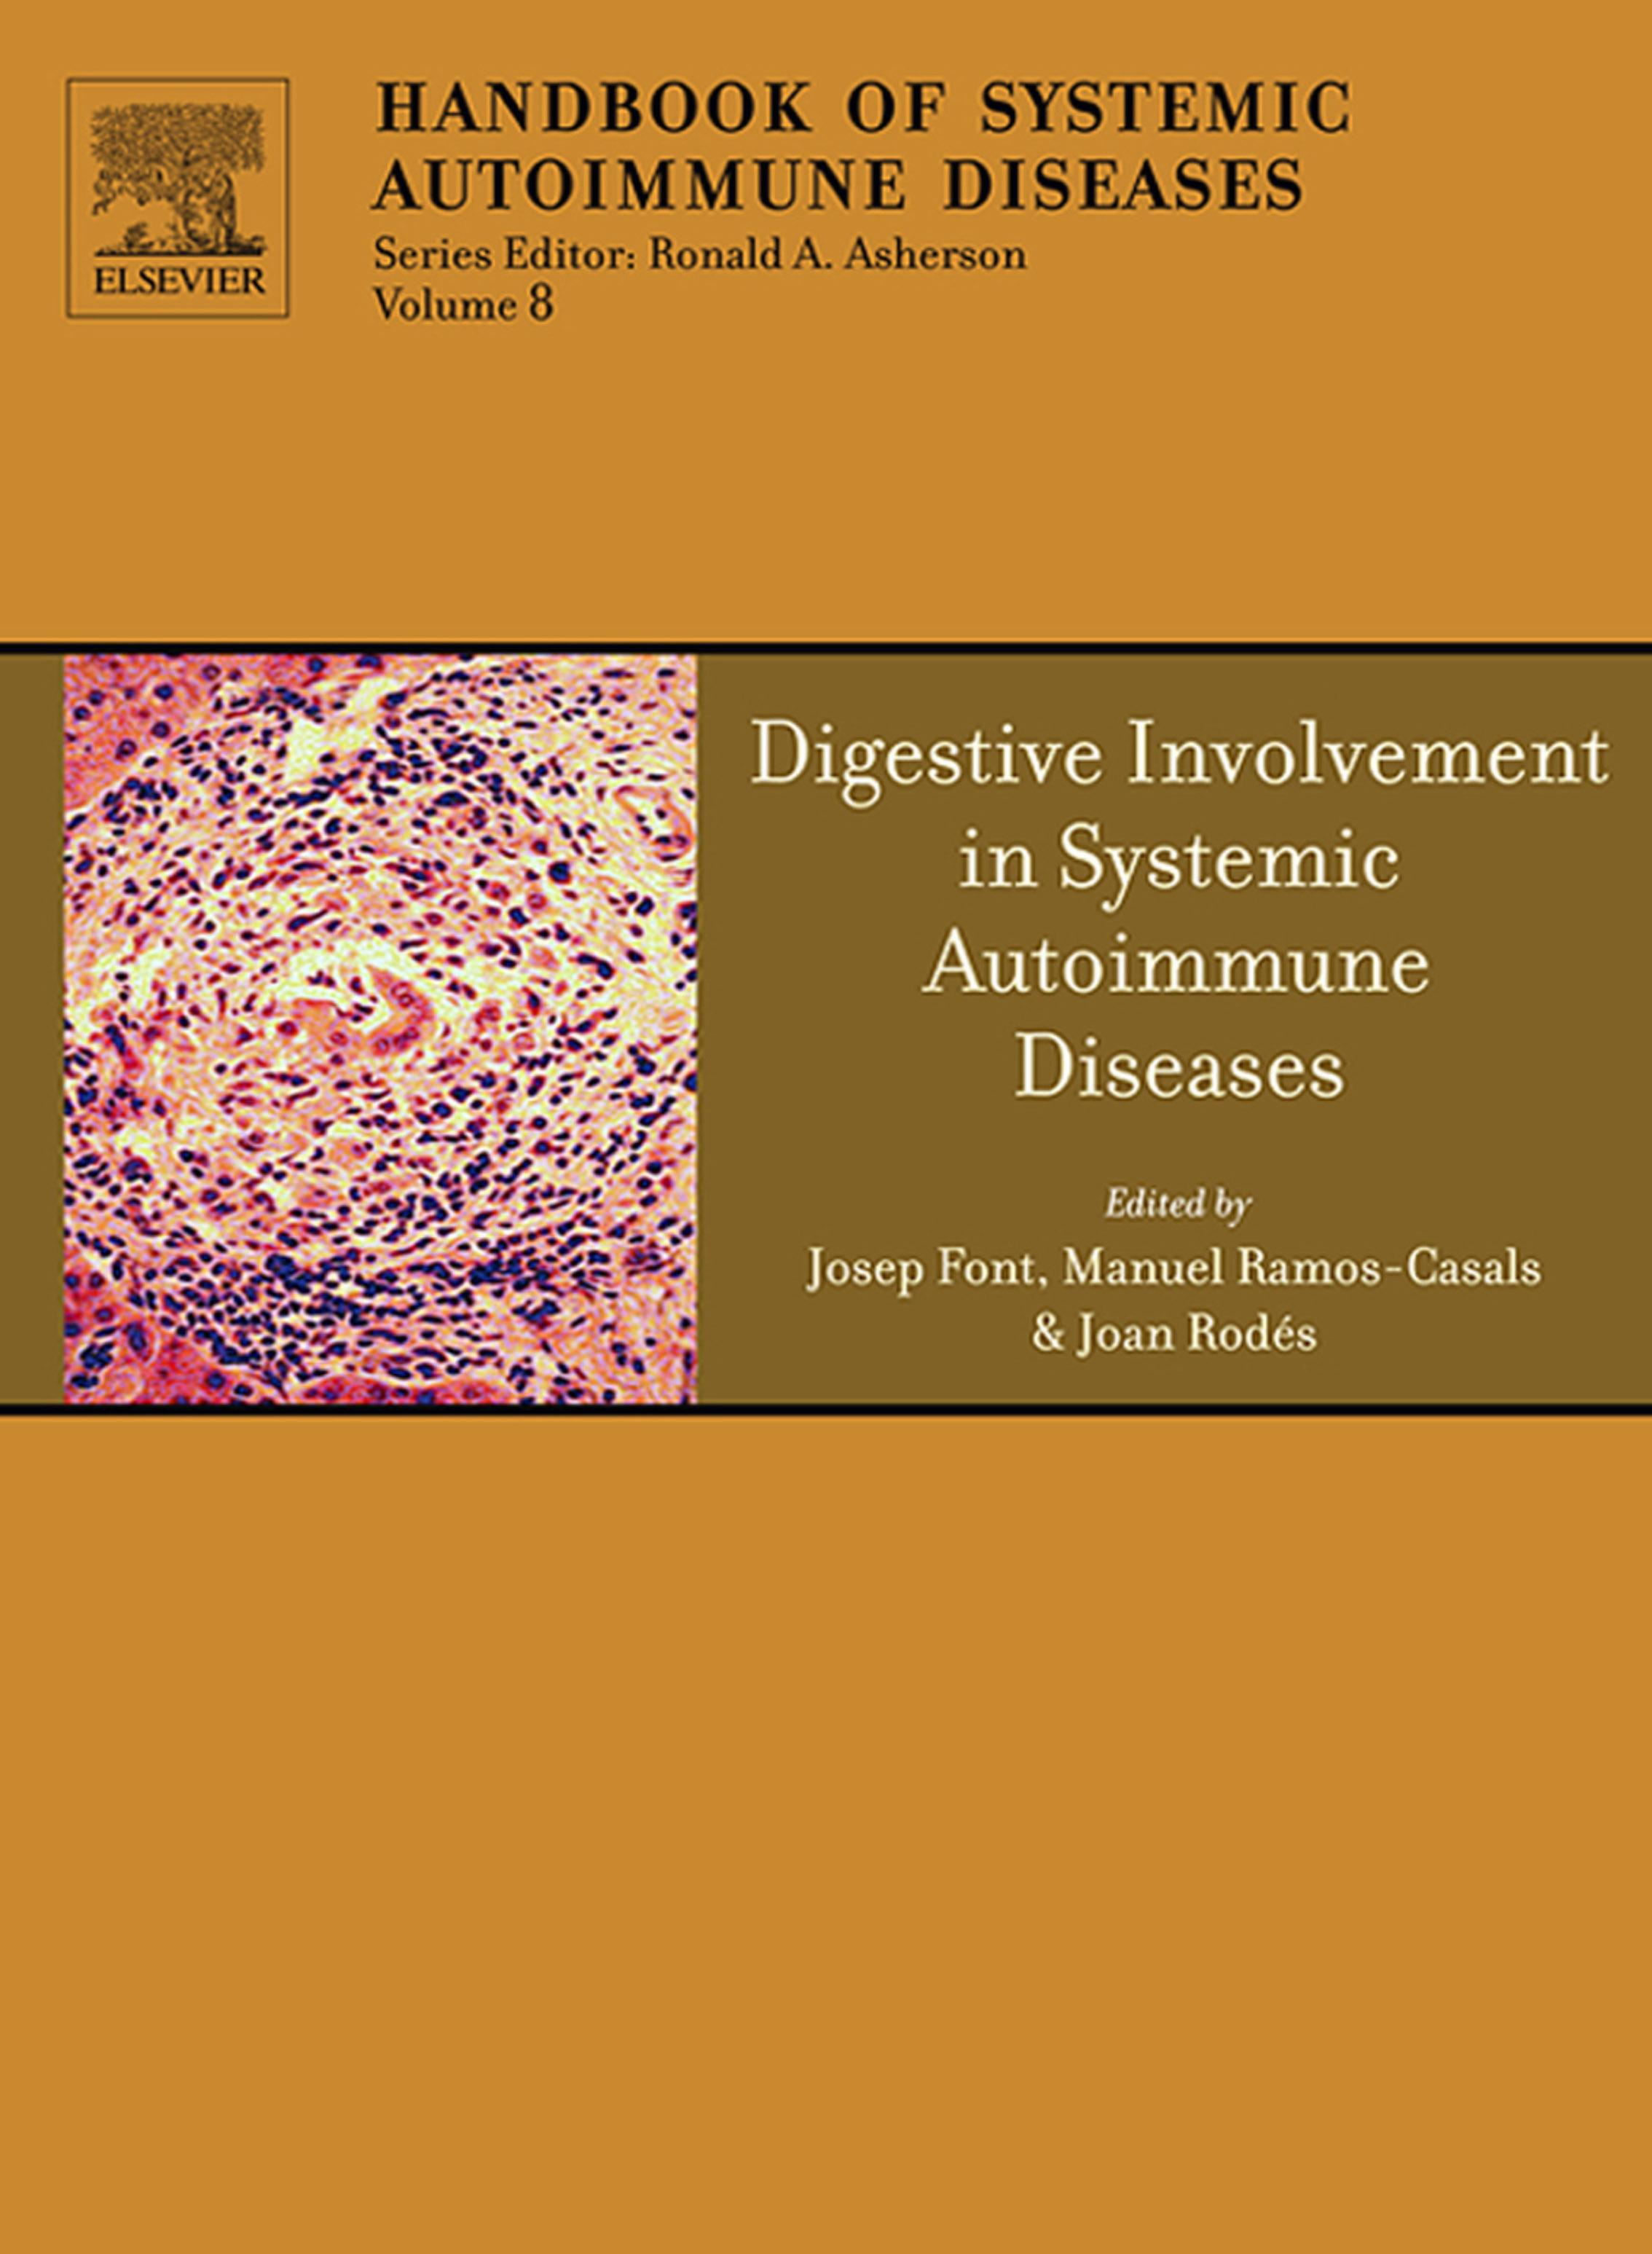 Digestive Involvement in Systemic Autoimmune Diseases EB9780080559315